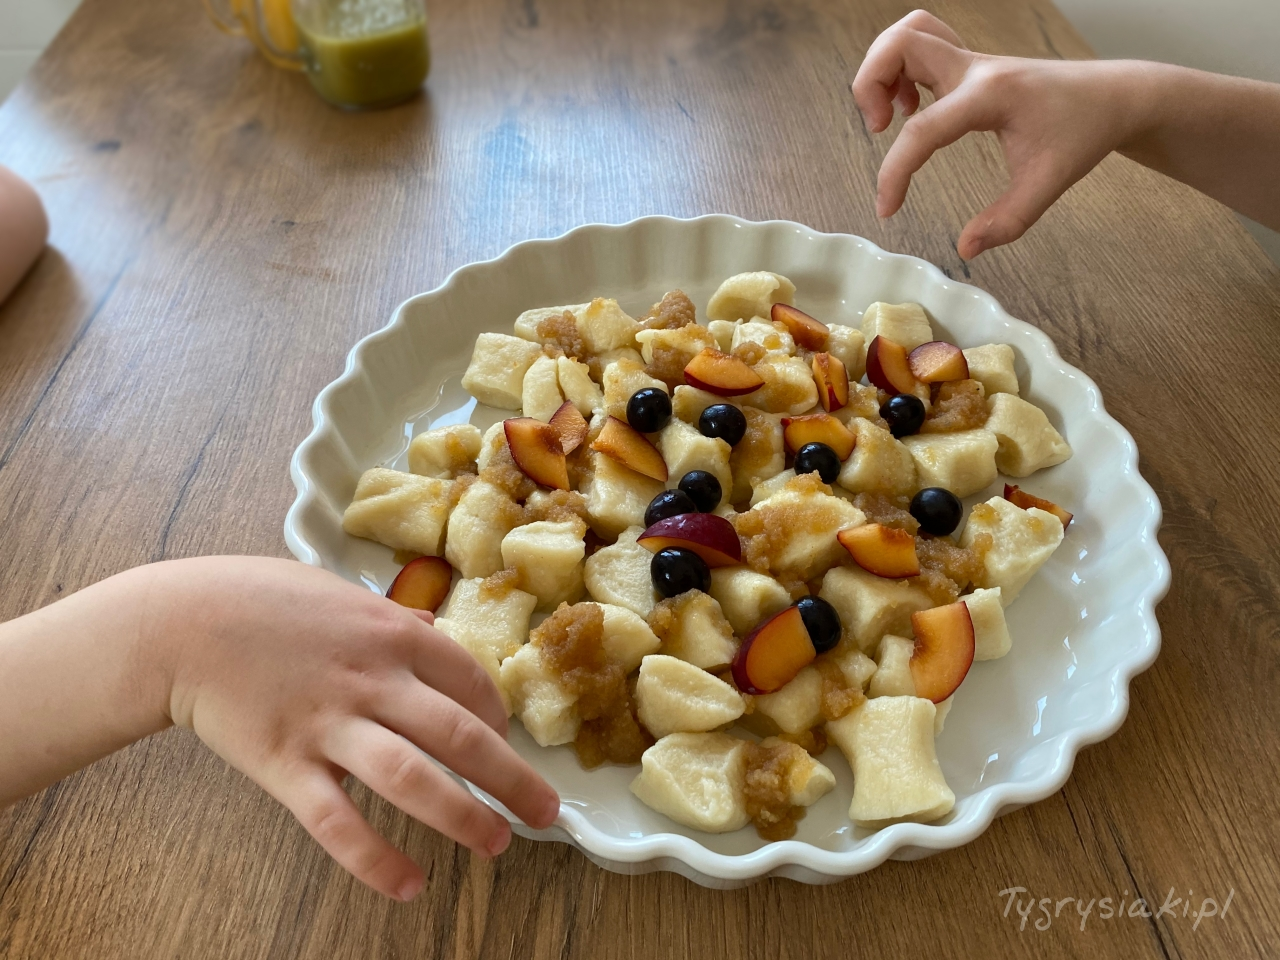 leniwe posypane owocami